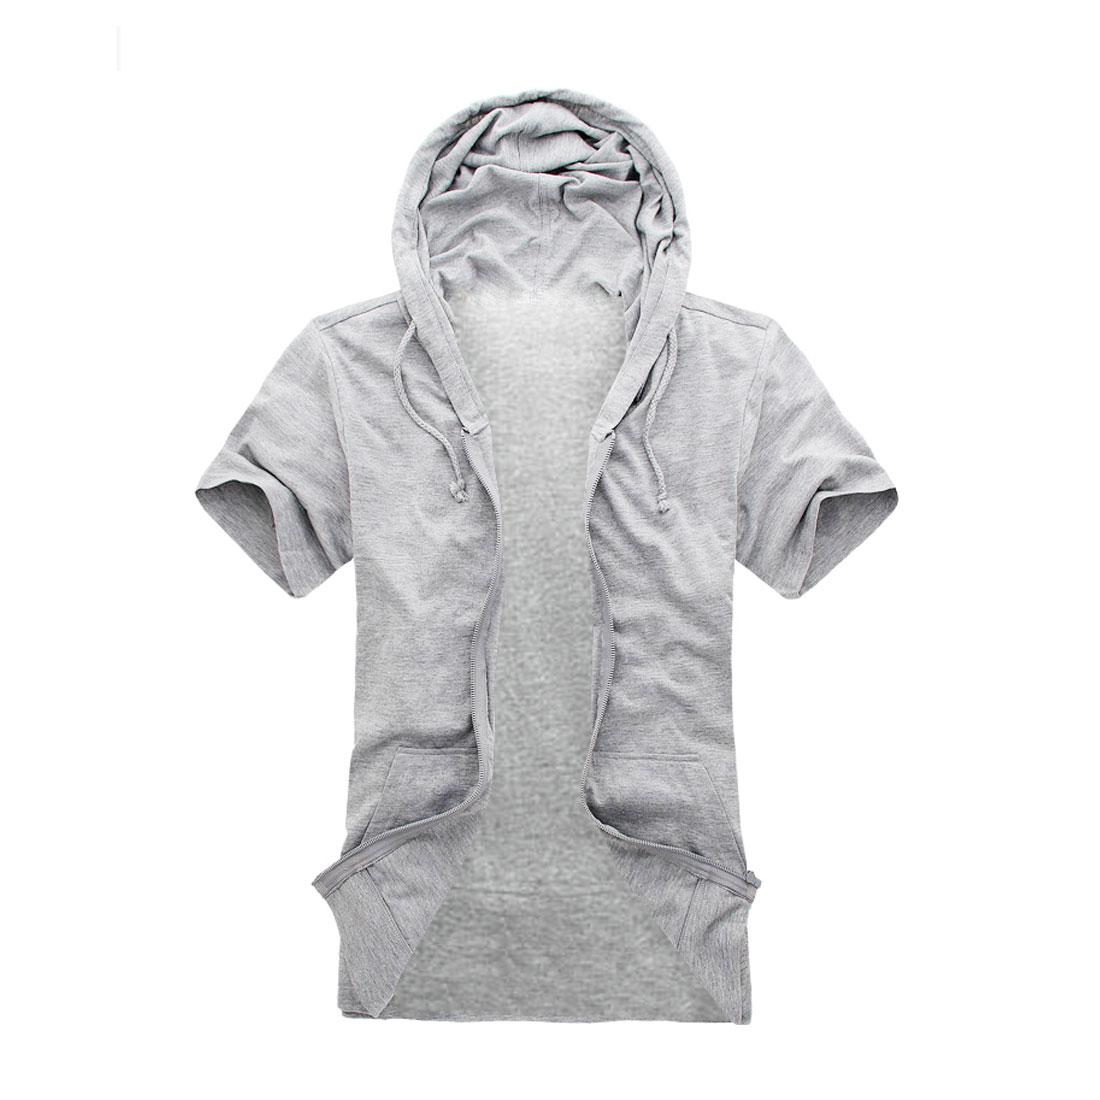 Mens Drawstring Hood Zip Up Fashional Design Light Gray Hoody M